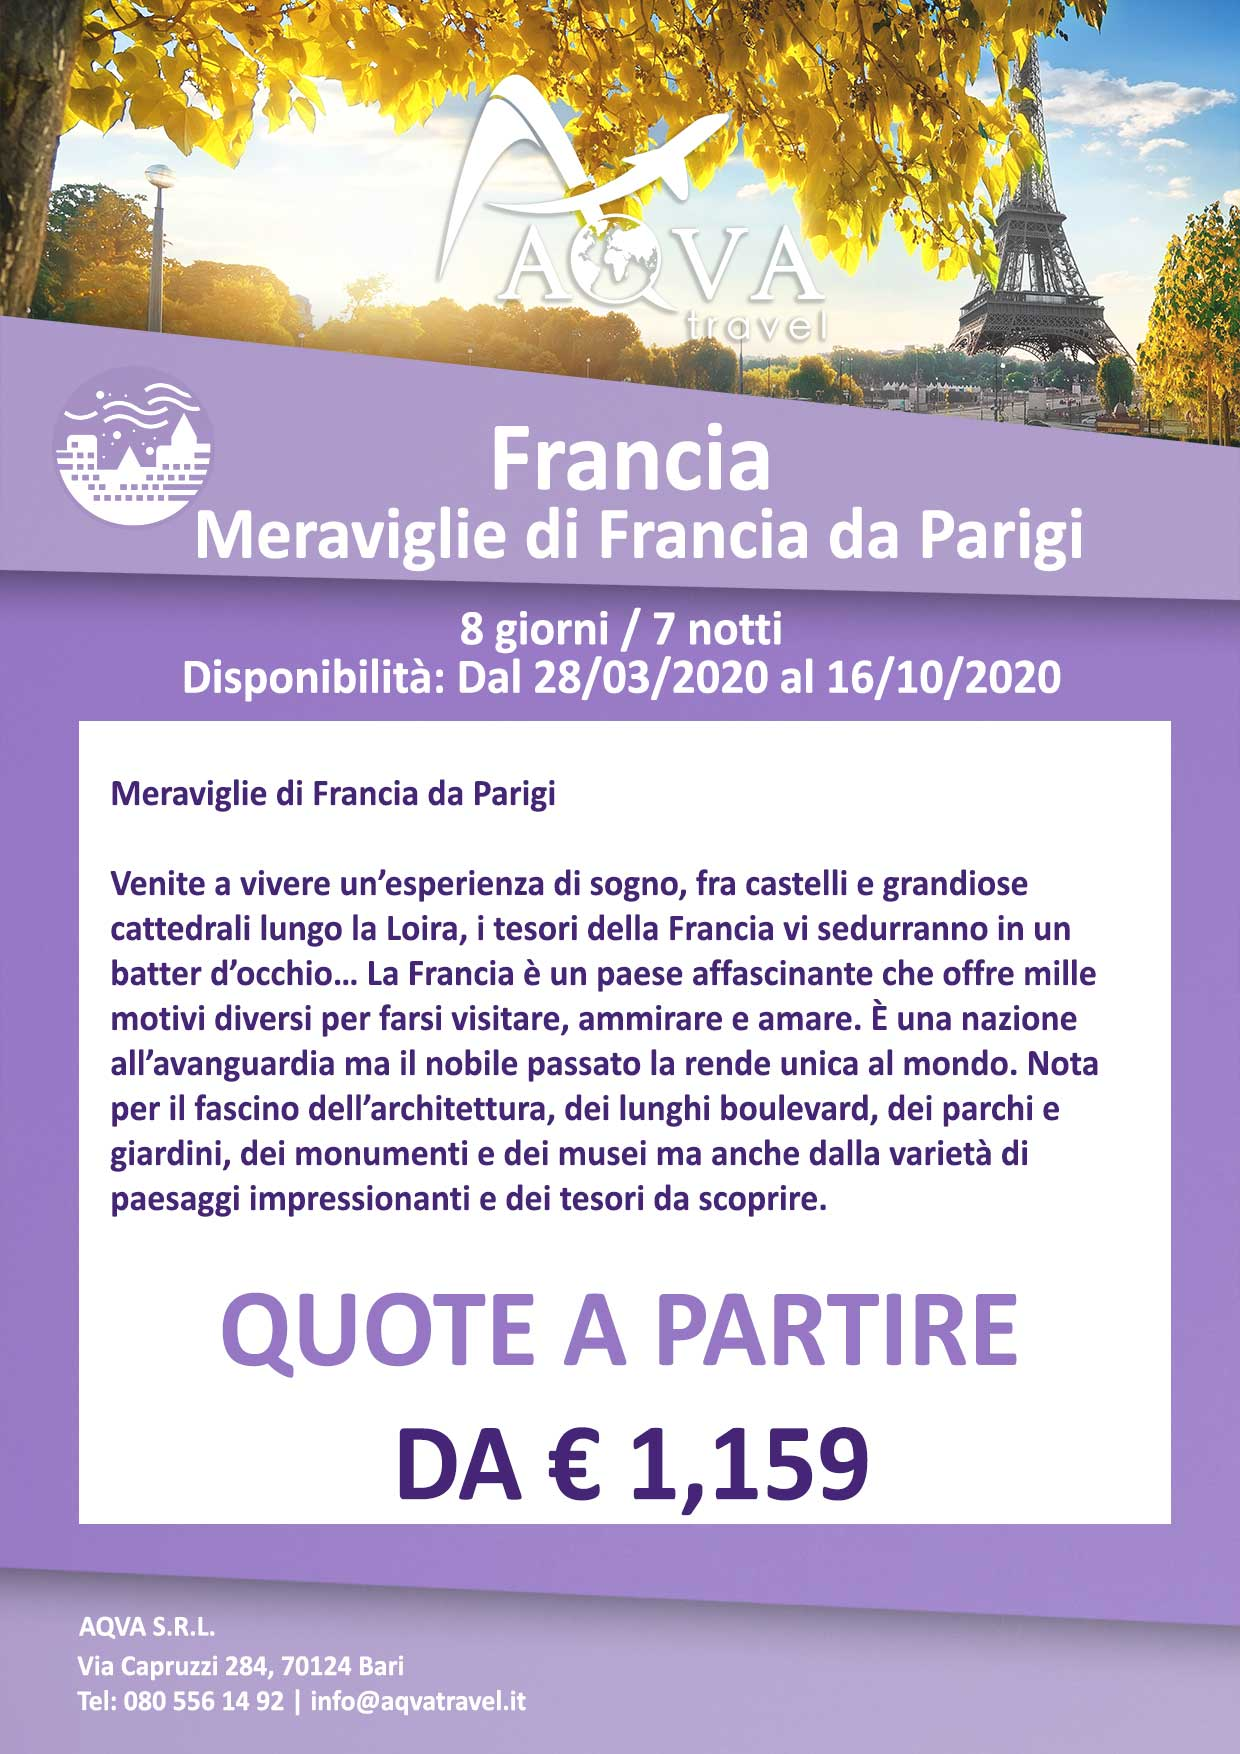 Meraviglie-di-Francia-da-Parigi-offerte-agenzia-di-viaggi-Bari-AQVATRAVEL-it